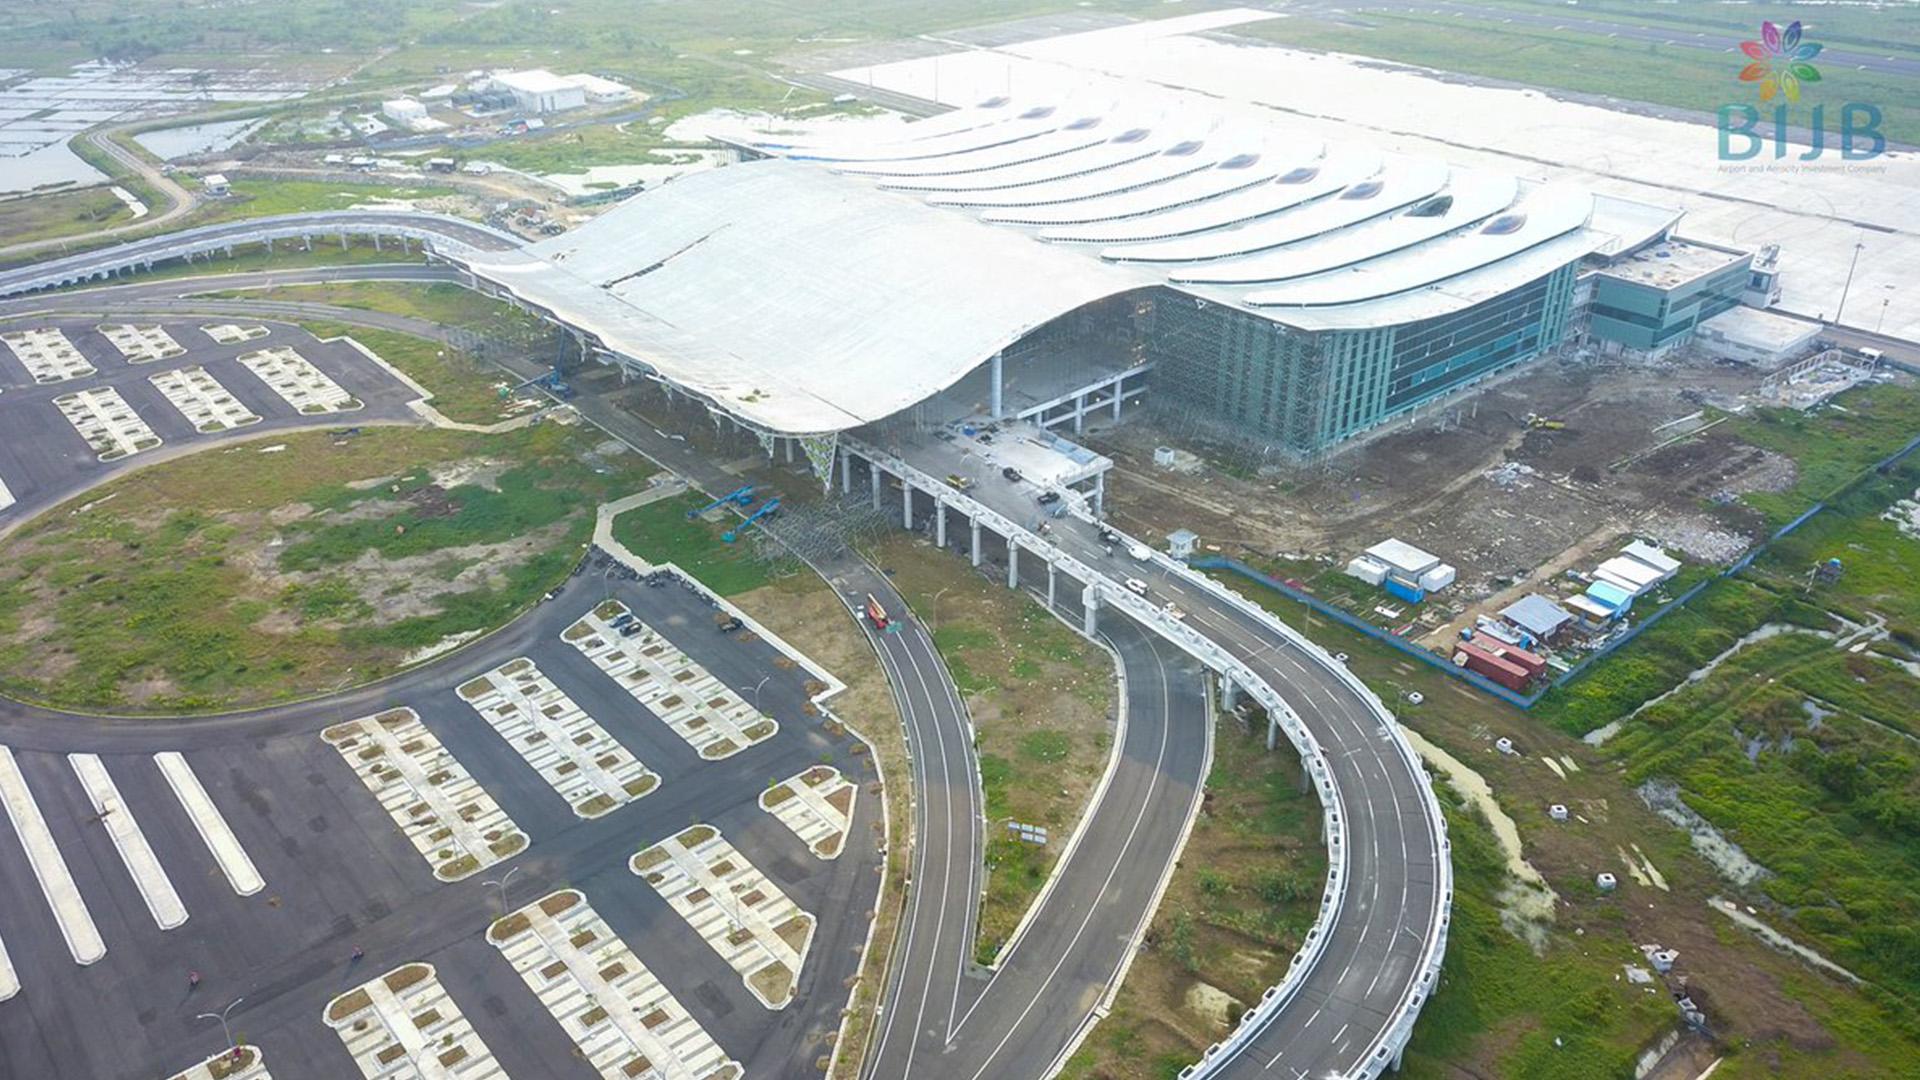 Mengintip kemegahan Bandara Internasional Kertajati Jawa Barat